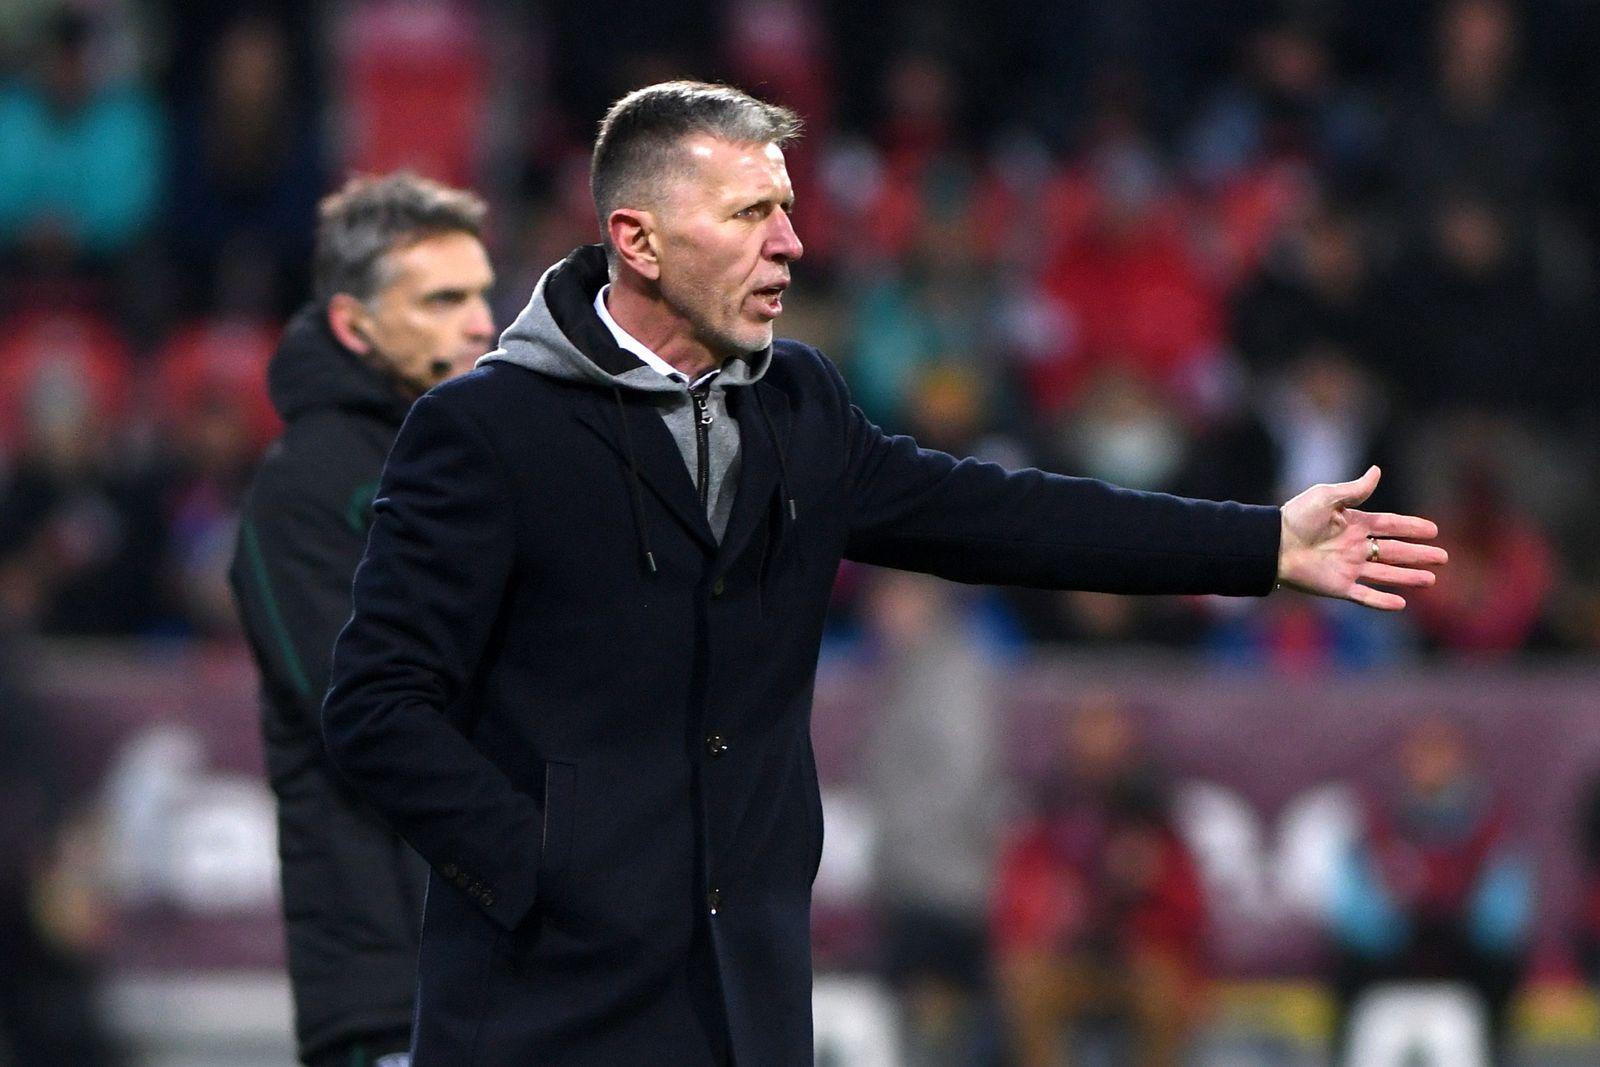 EUROPEAN UEFA QUALIFY EURO 2020, PILSEN 14-11-2019, CZECH REPUBLIC-KOSOVO 2-1, COACH JAROSLAV SILHAVY QUALIFICAZIONI EUR